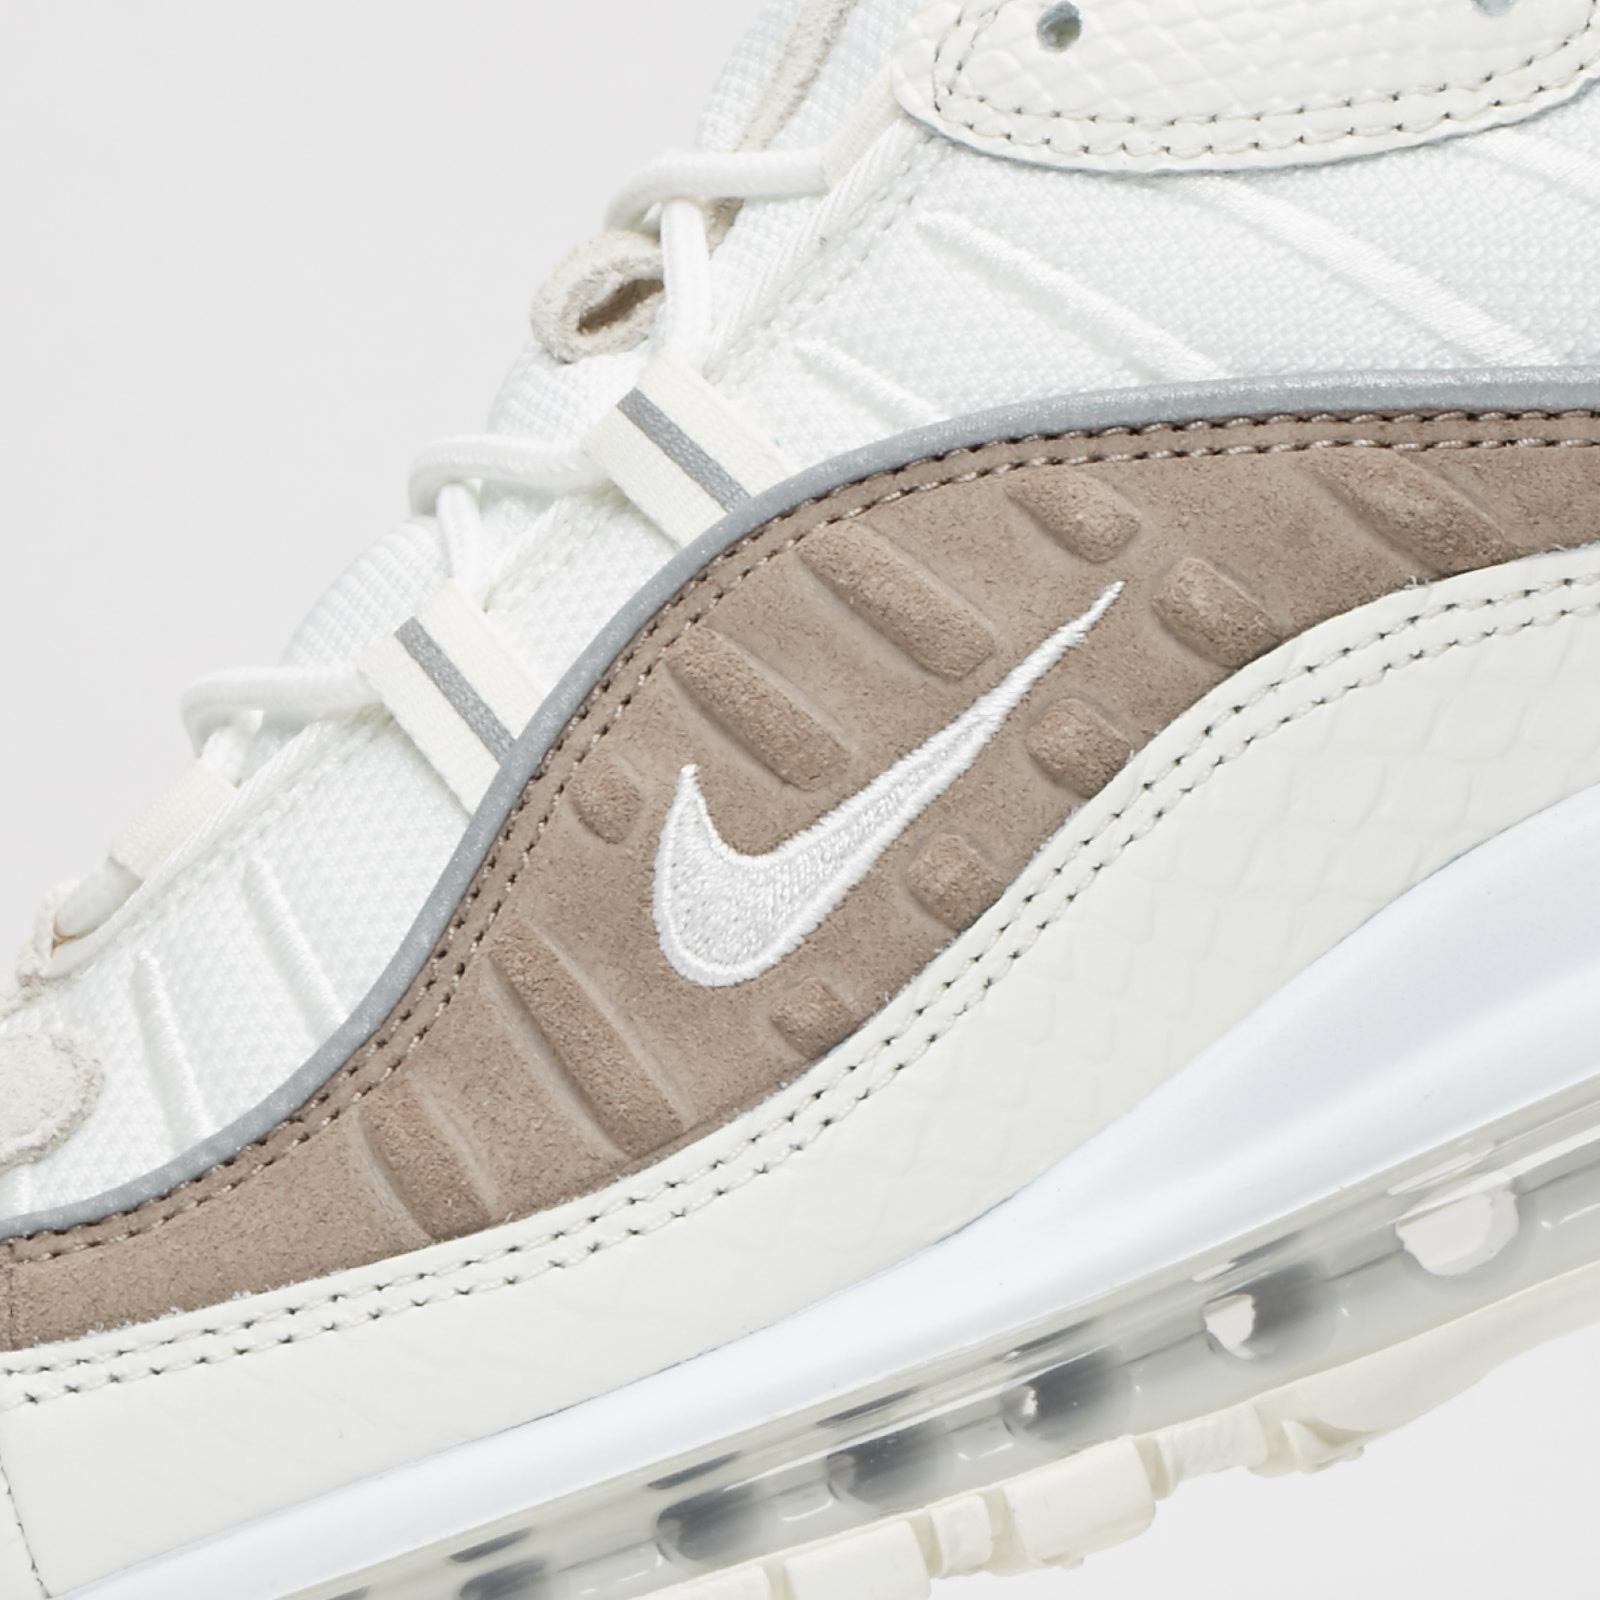 6813b2208b572 Nike Air Max 98 SE - Ao9380-100 - Sneakersnstuff